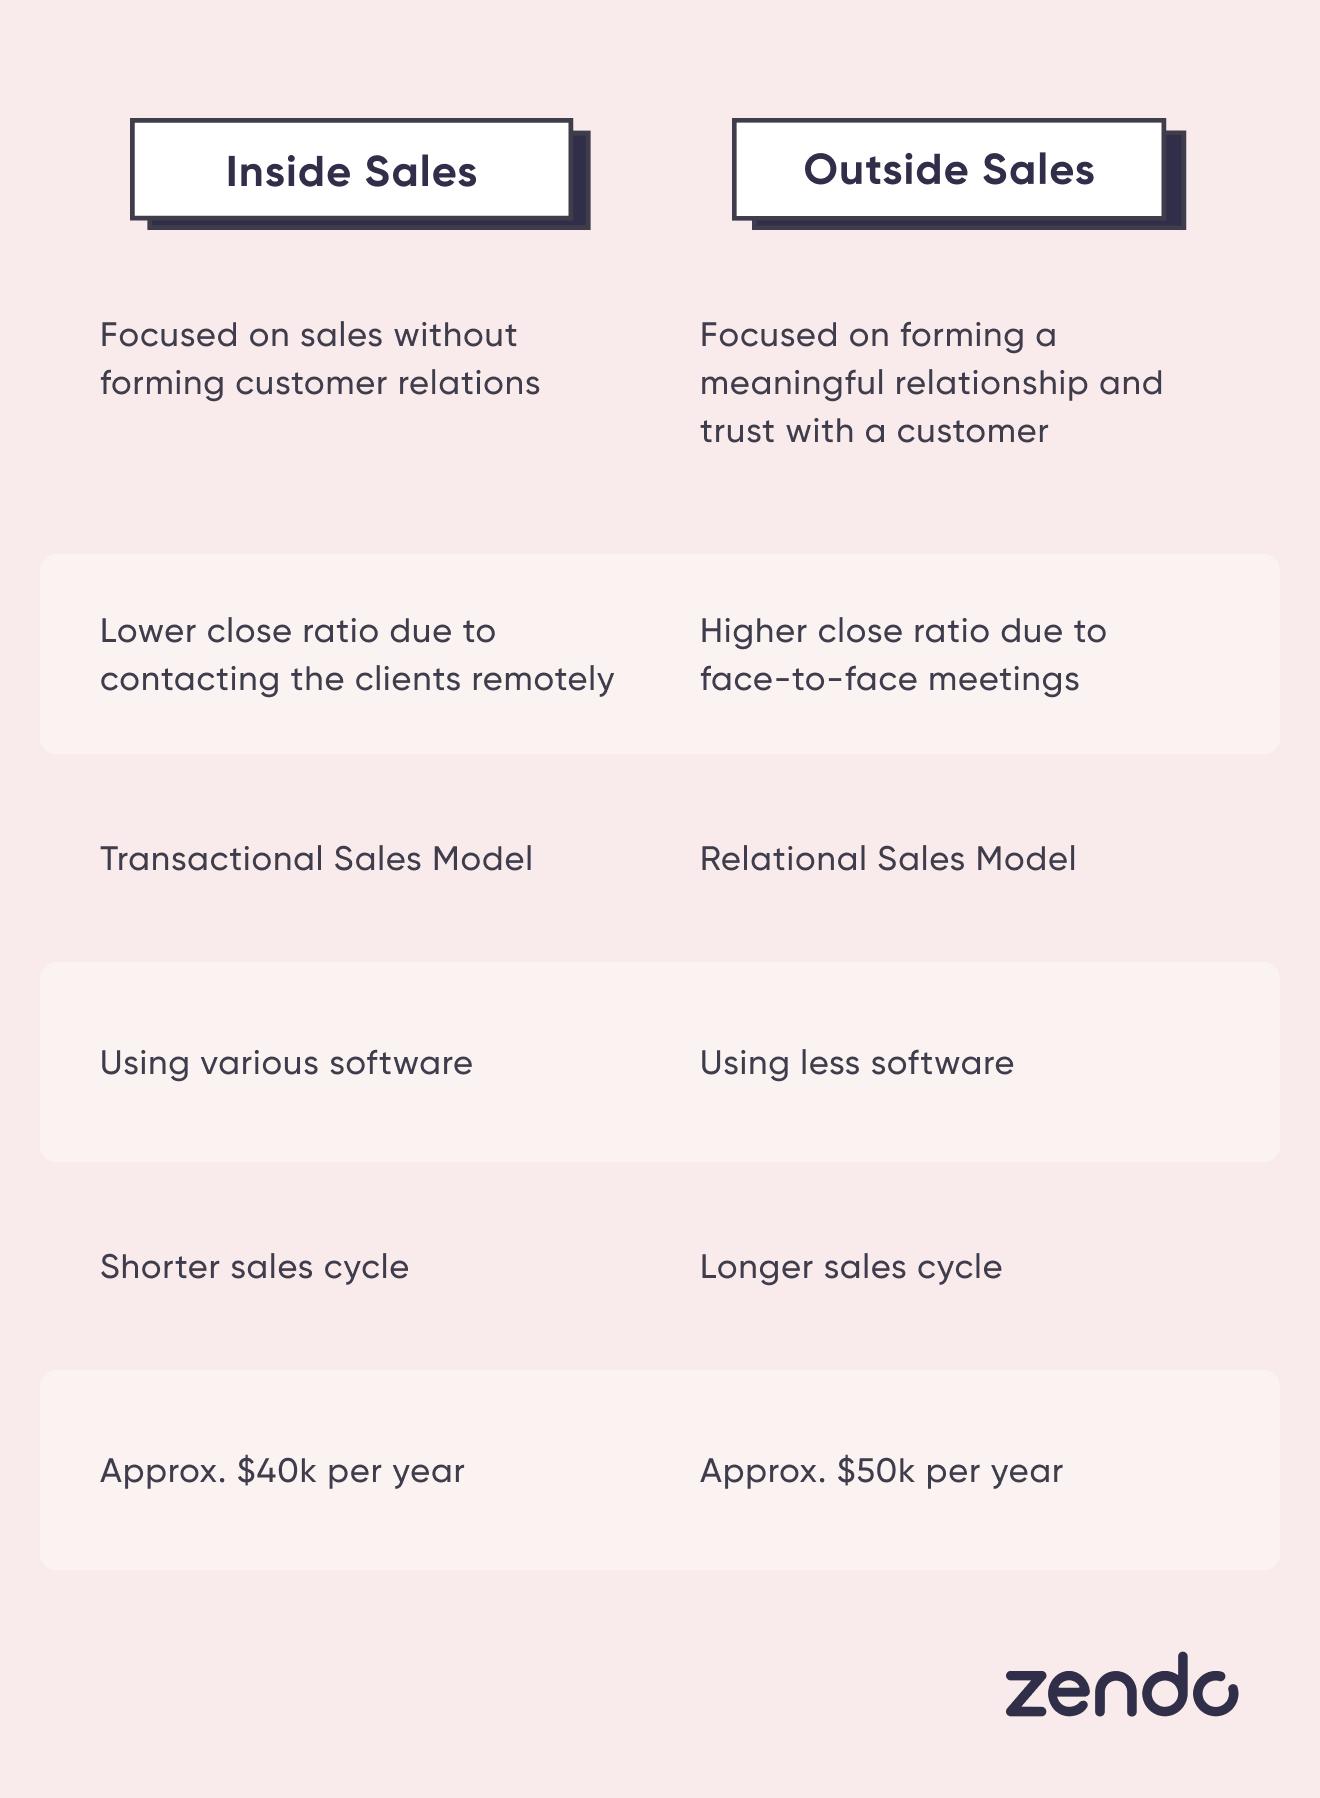 Inside Sales vs Outside Sales